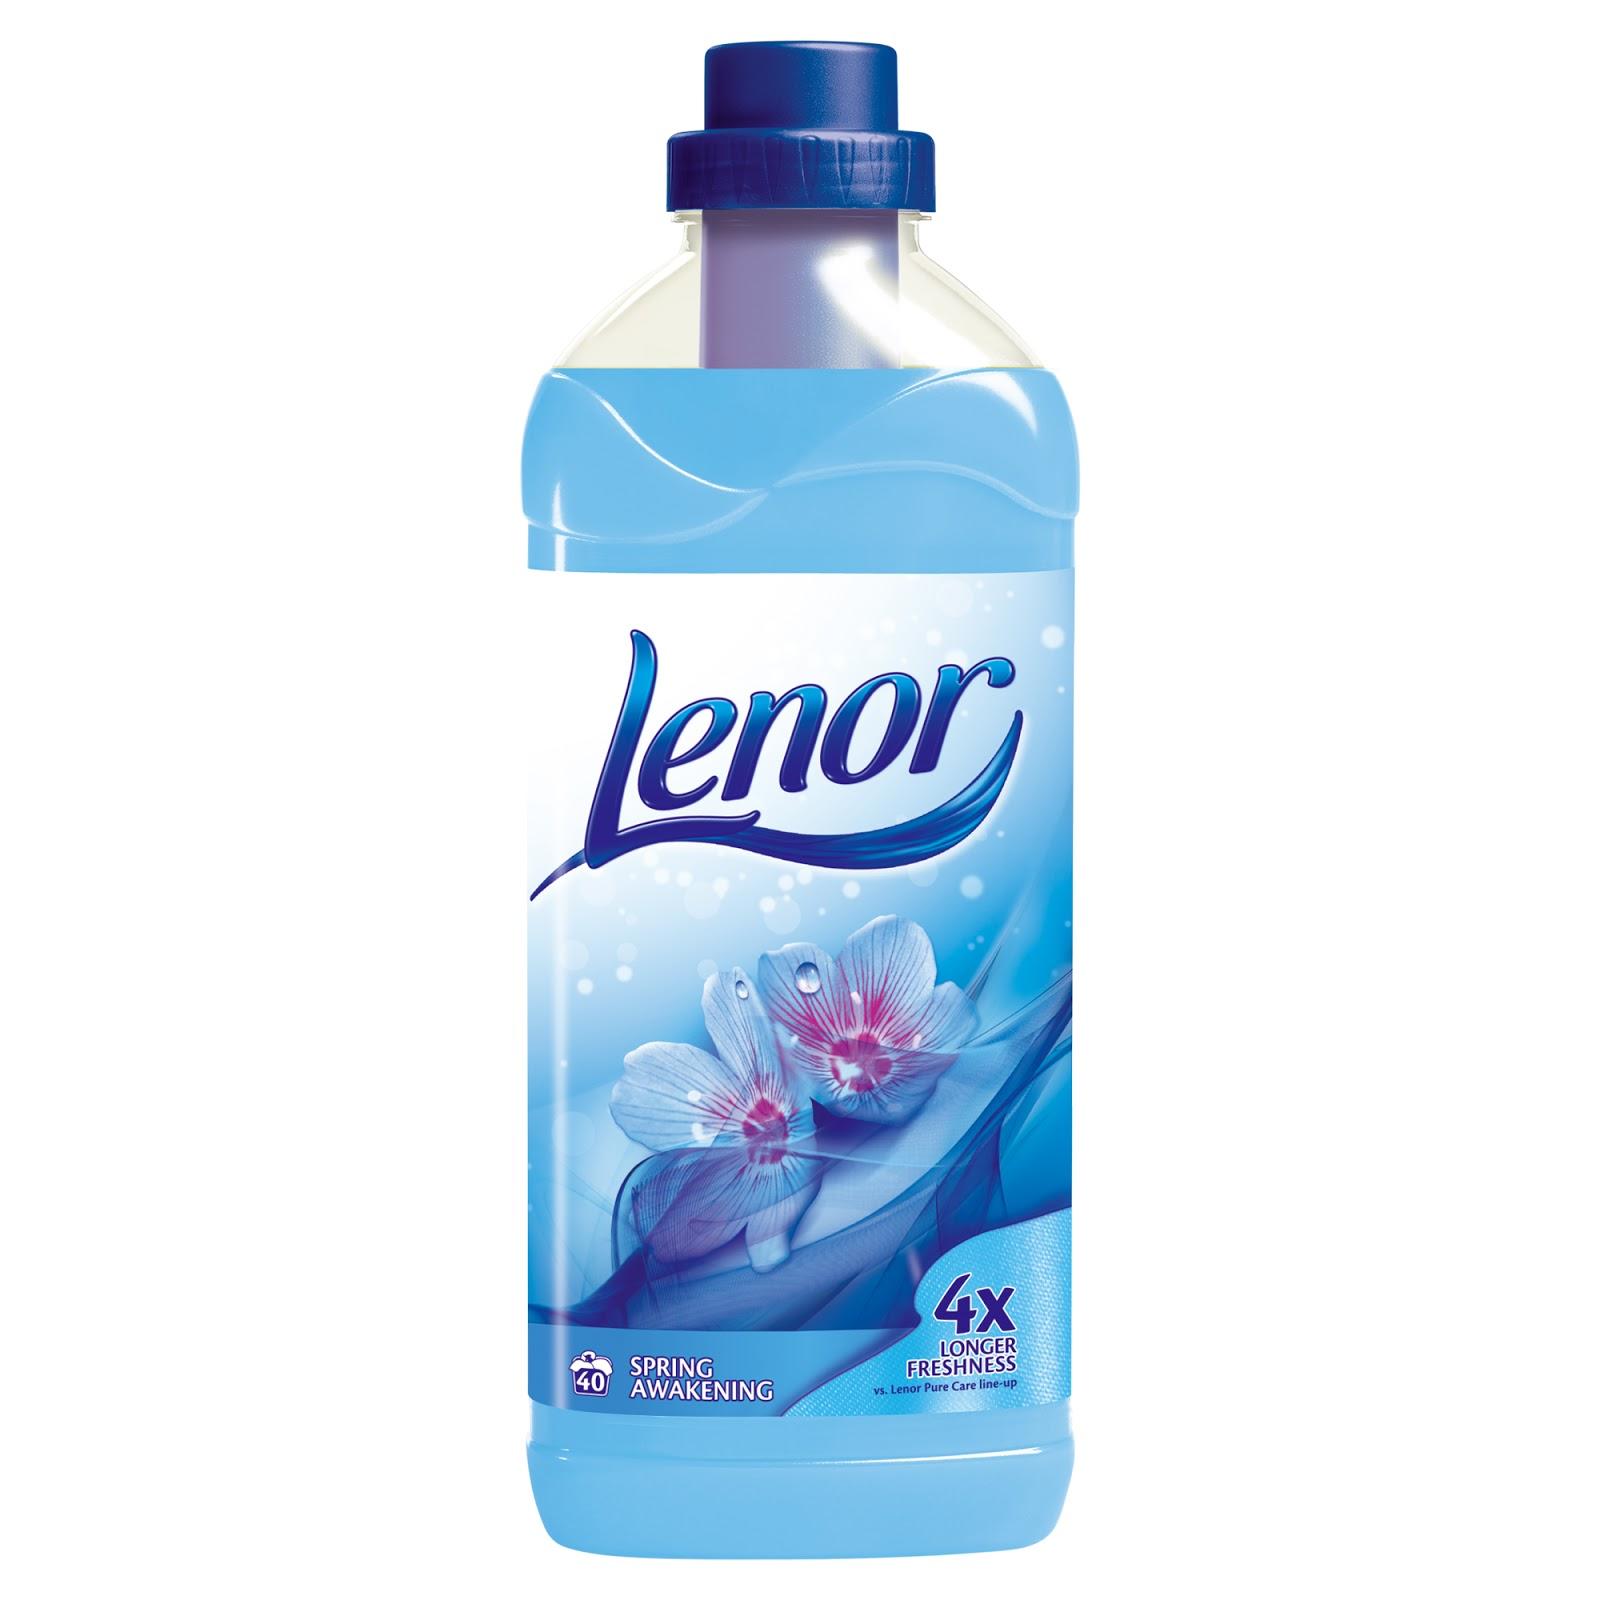 Mature manchester wife lubes up liquid silk - 1 part 5